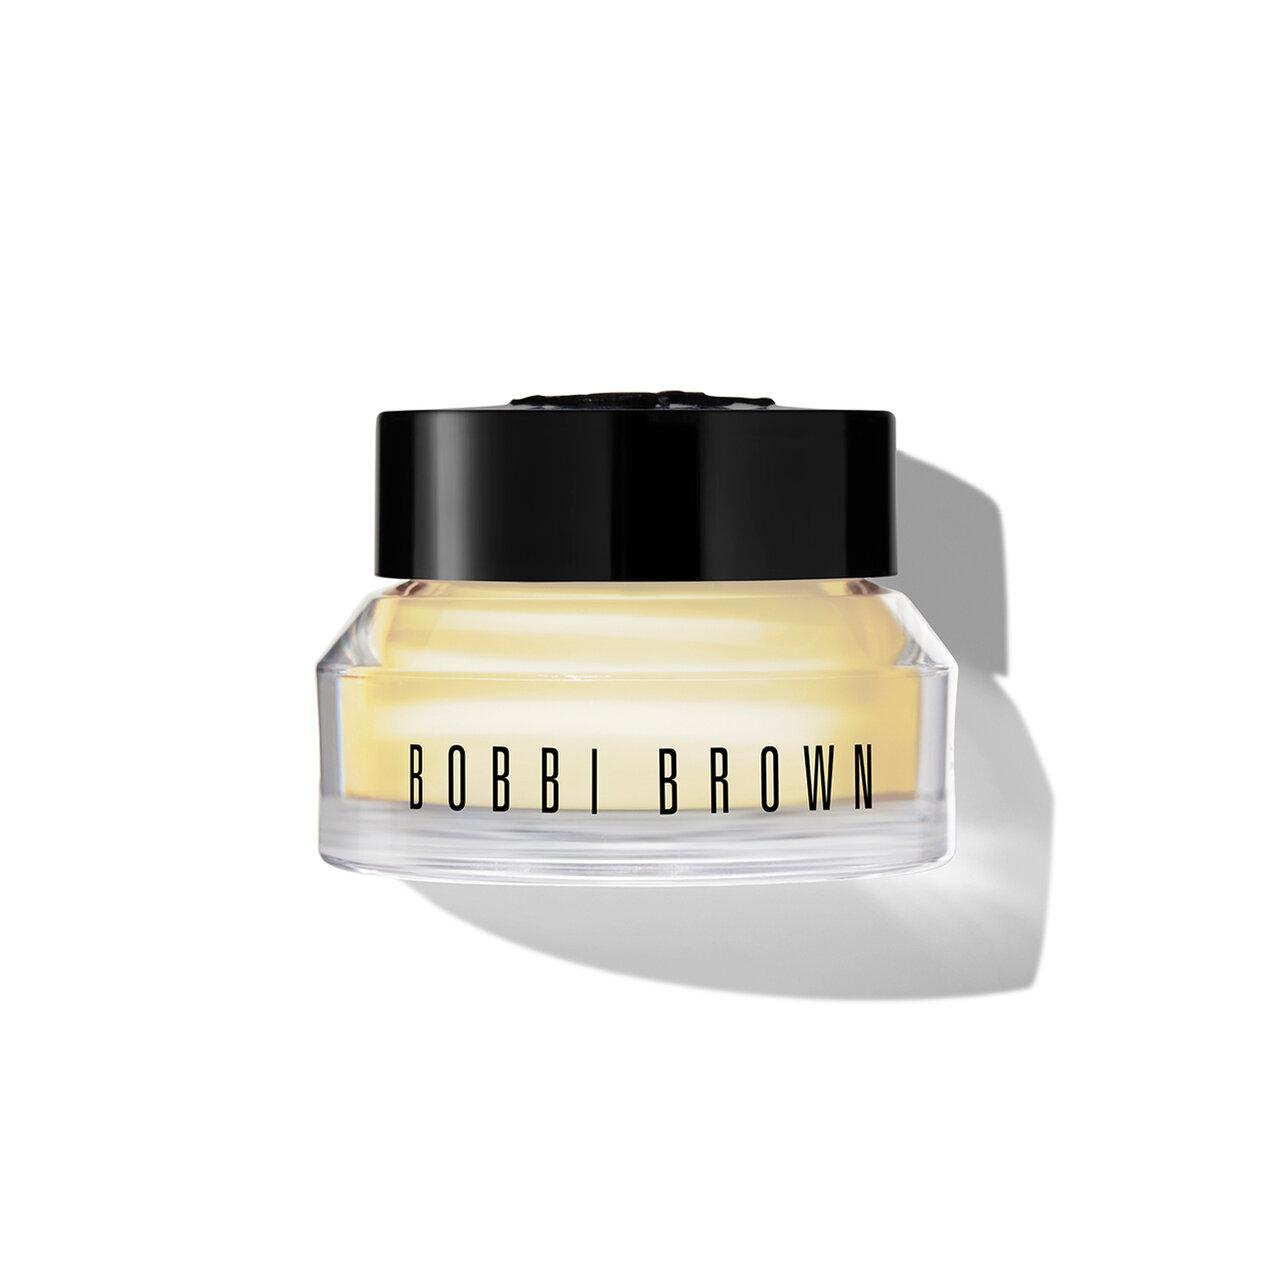 BOBBI BROWN(ボビイ ブラウン) 2021新作コスメ「ビタエンリッチド アイ ベース」